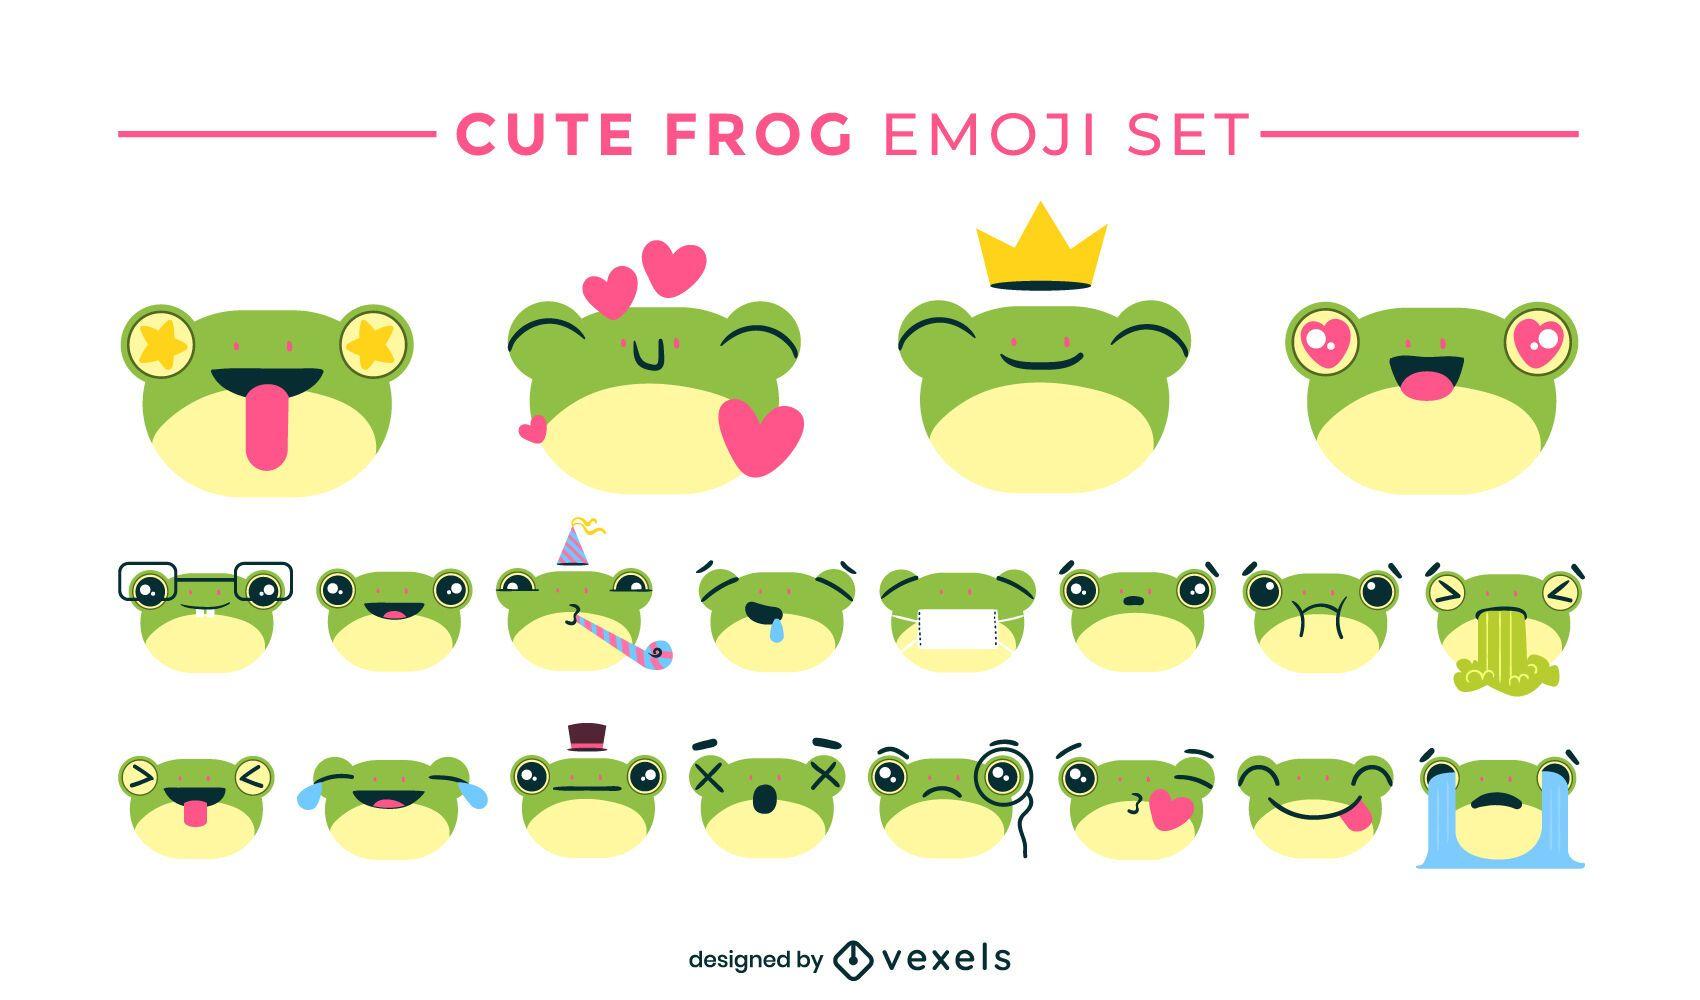 Cute frog emoji set design